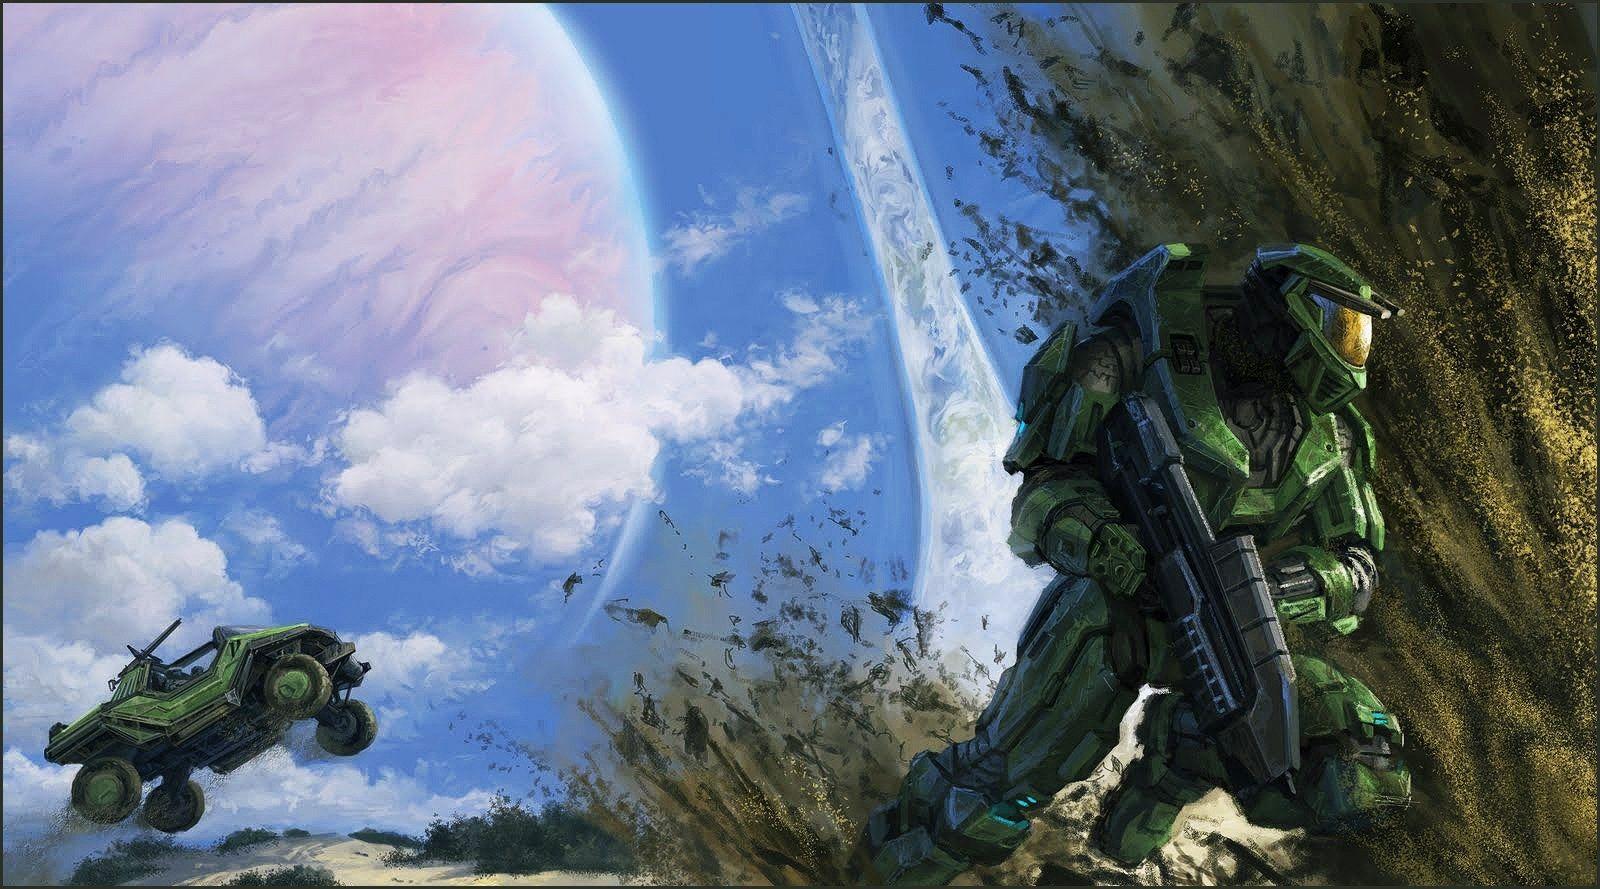 Halo Full Hd Background Halo Halo Series Halo Combat Evolved